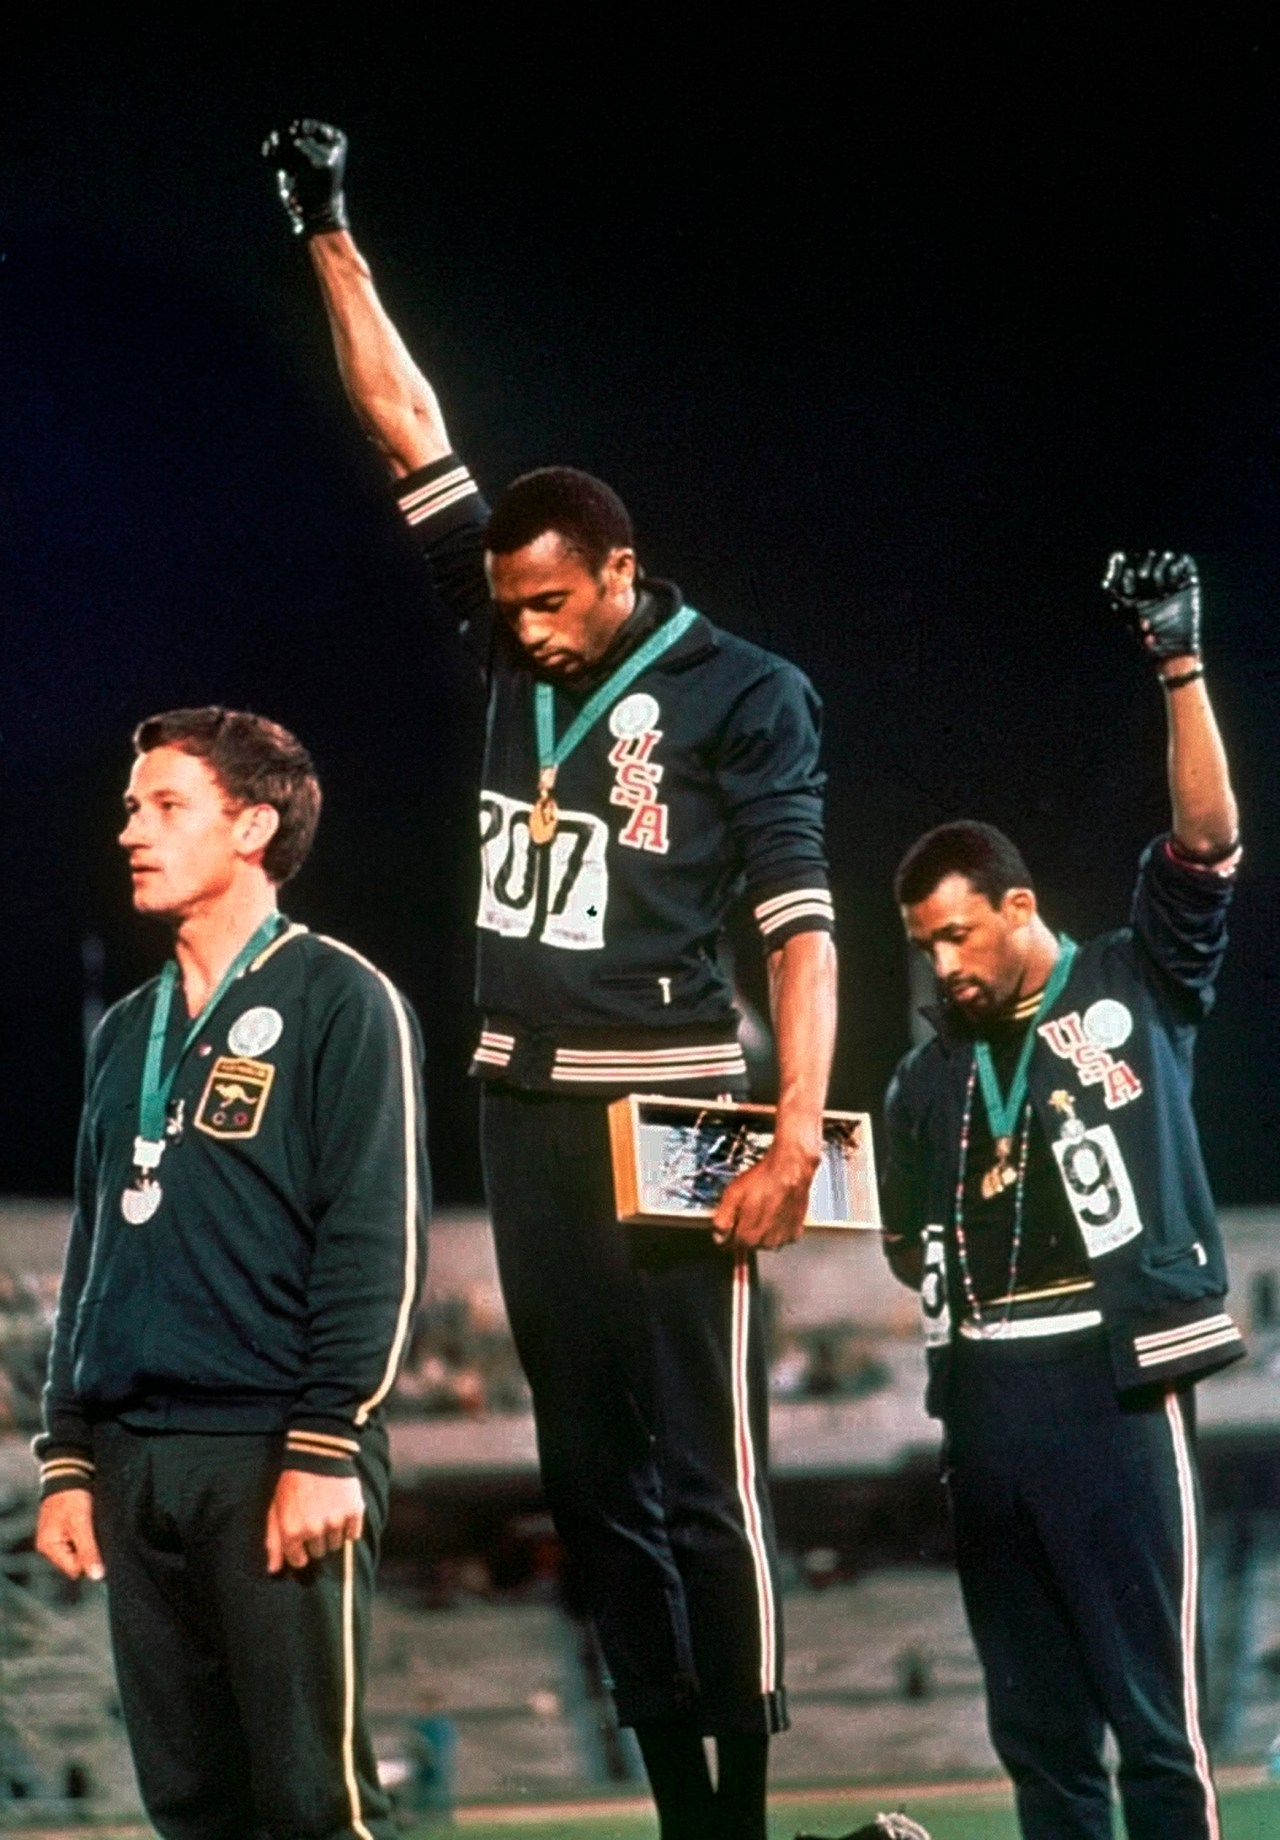 Baton Rouge Gold Teeth : baton, rouge, teeth, Raised, Fists,, Kneeling, During, Anthem, Olympic, Trials, BRProud.com